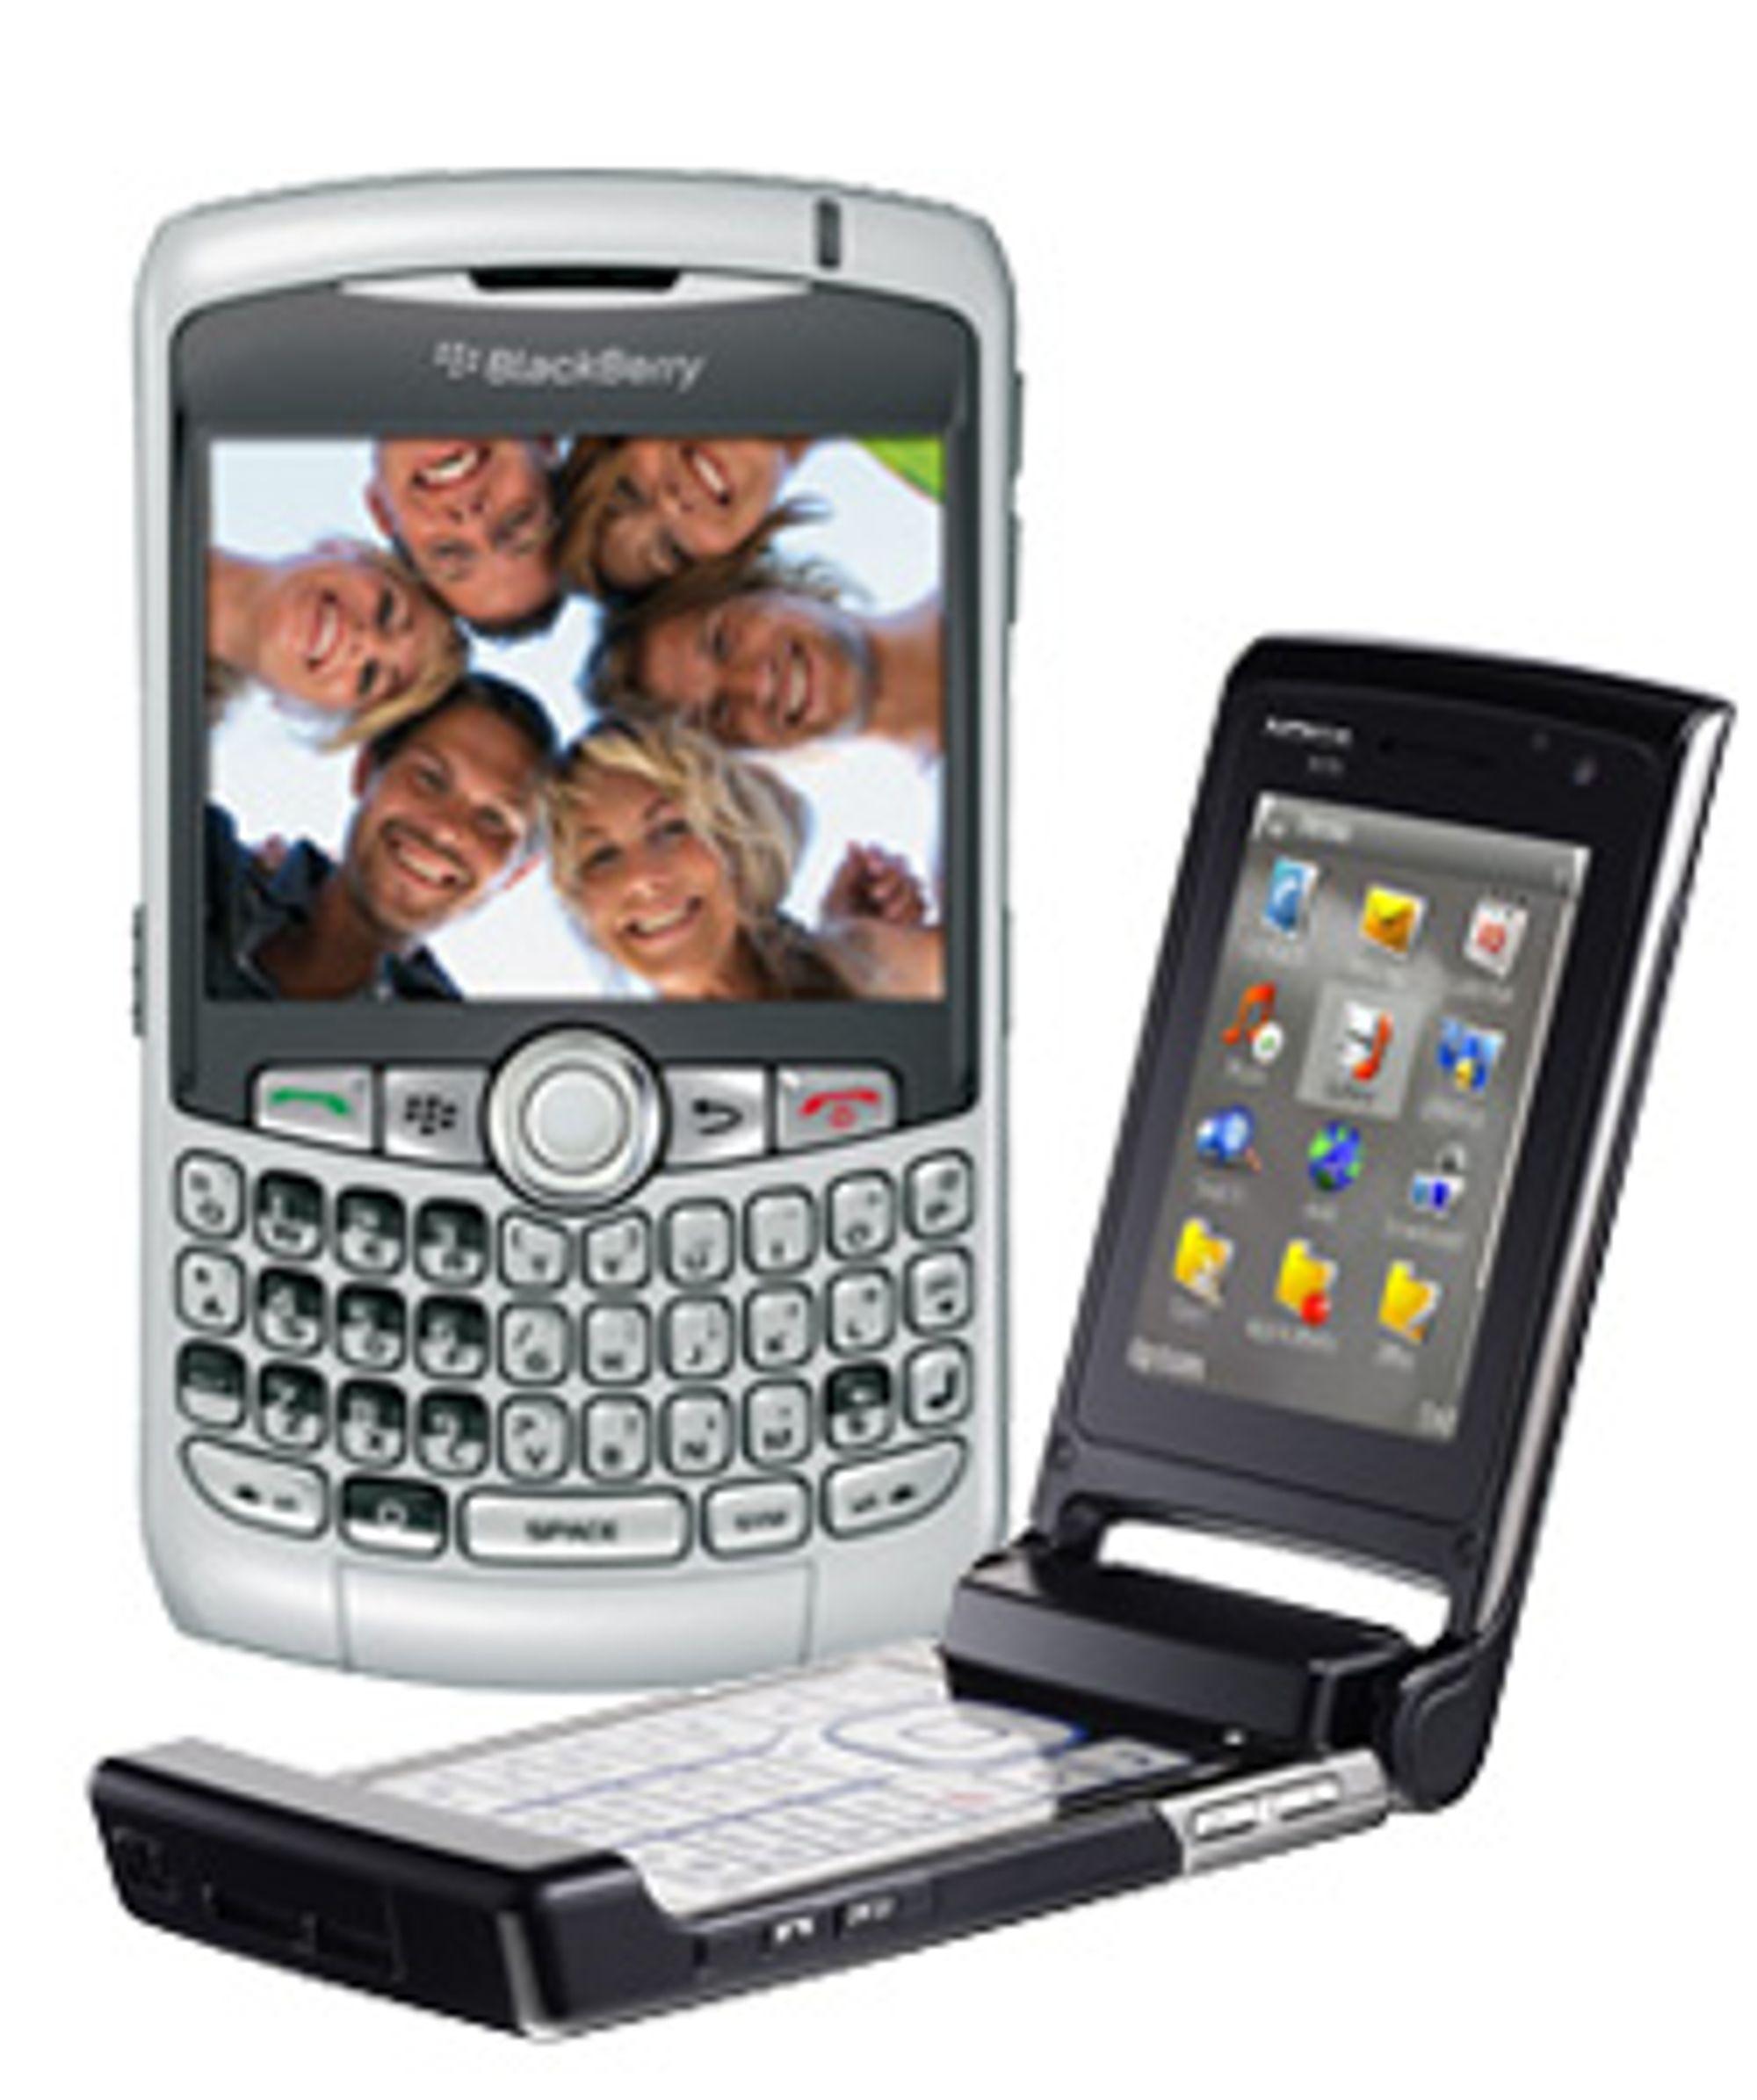 Skal Nokia sluke Blackberry? (Foto: RIM / Nokia)